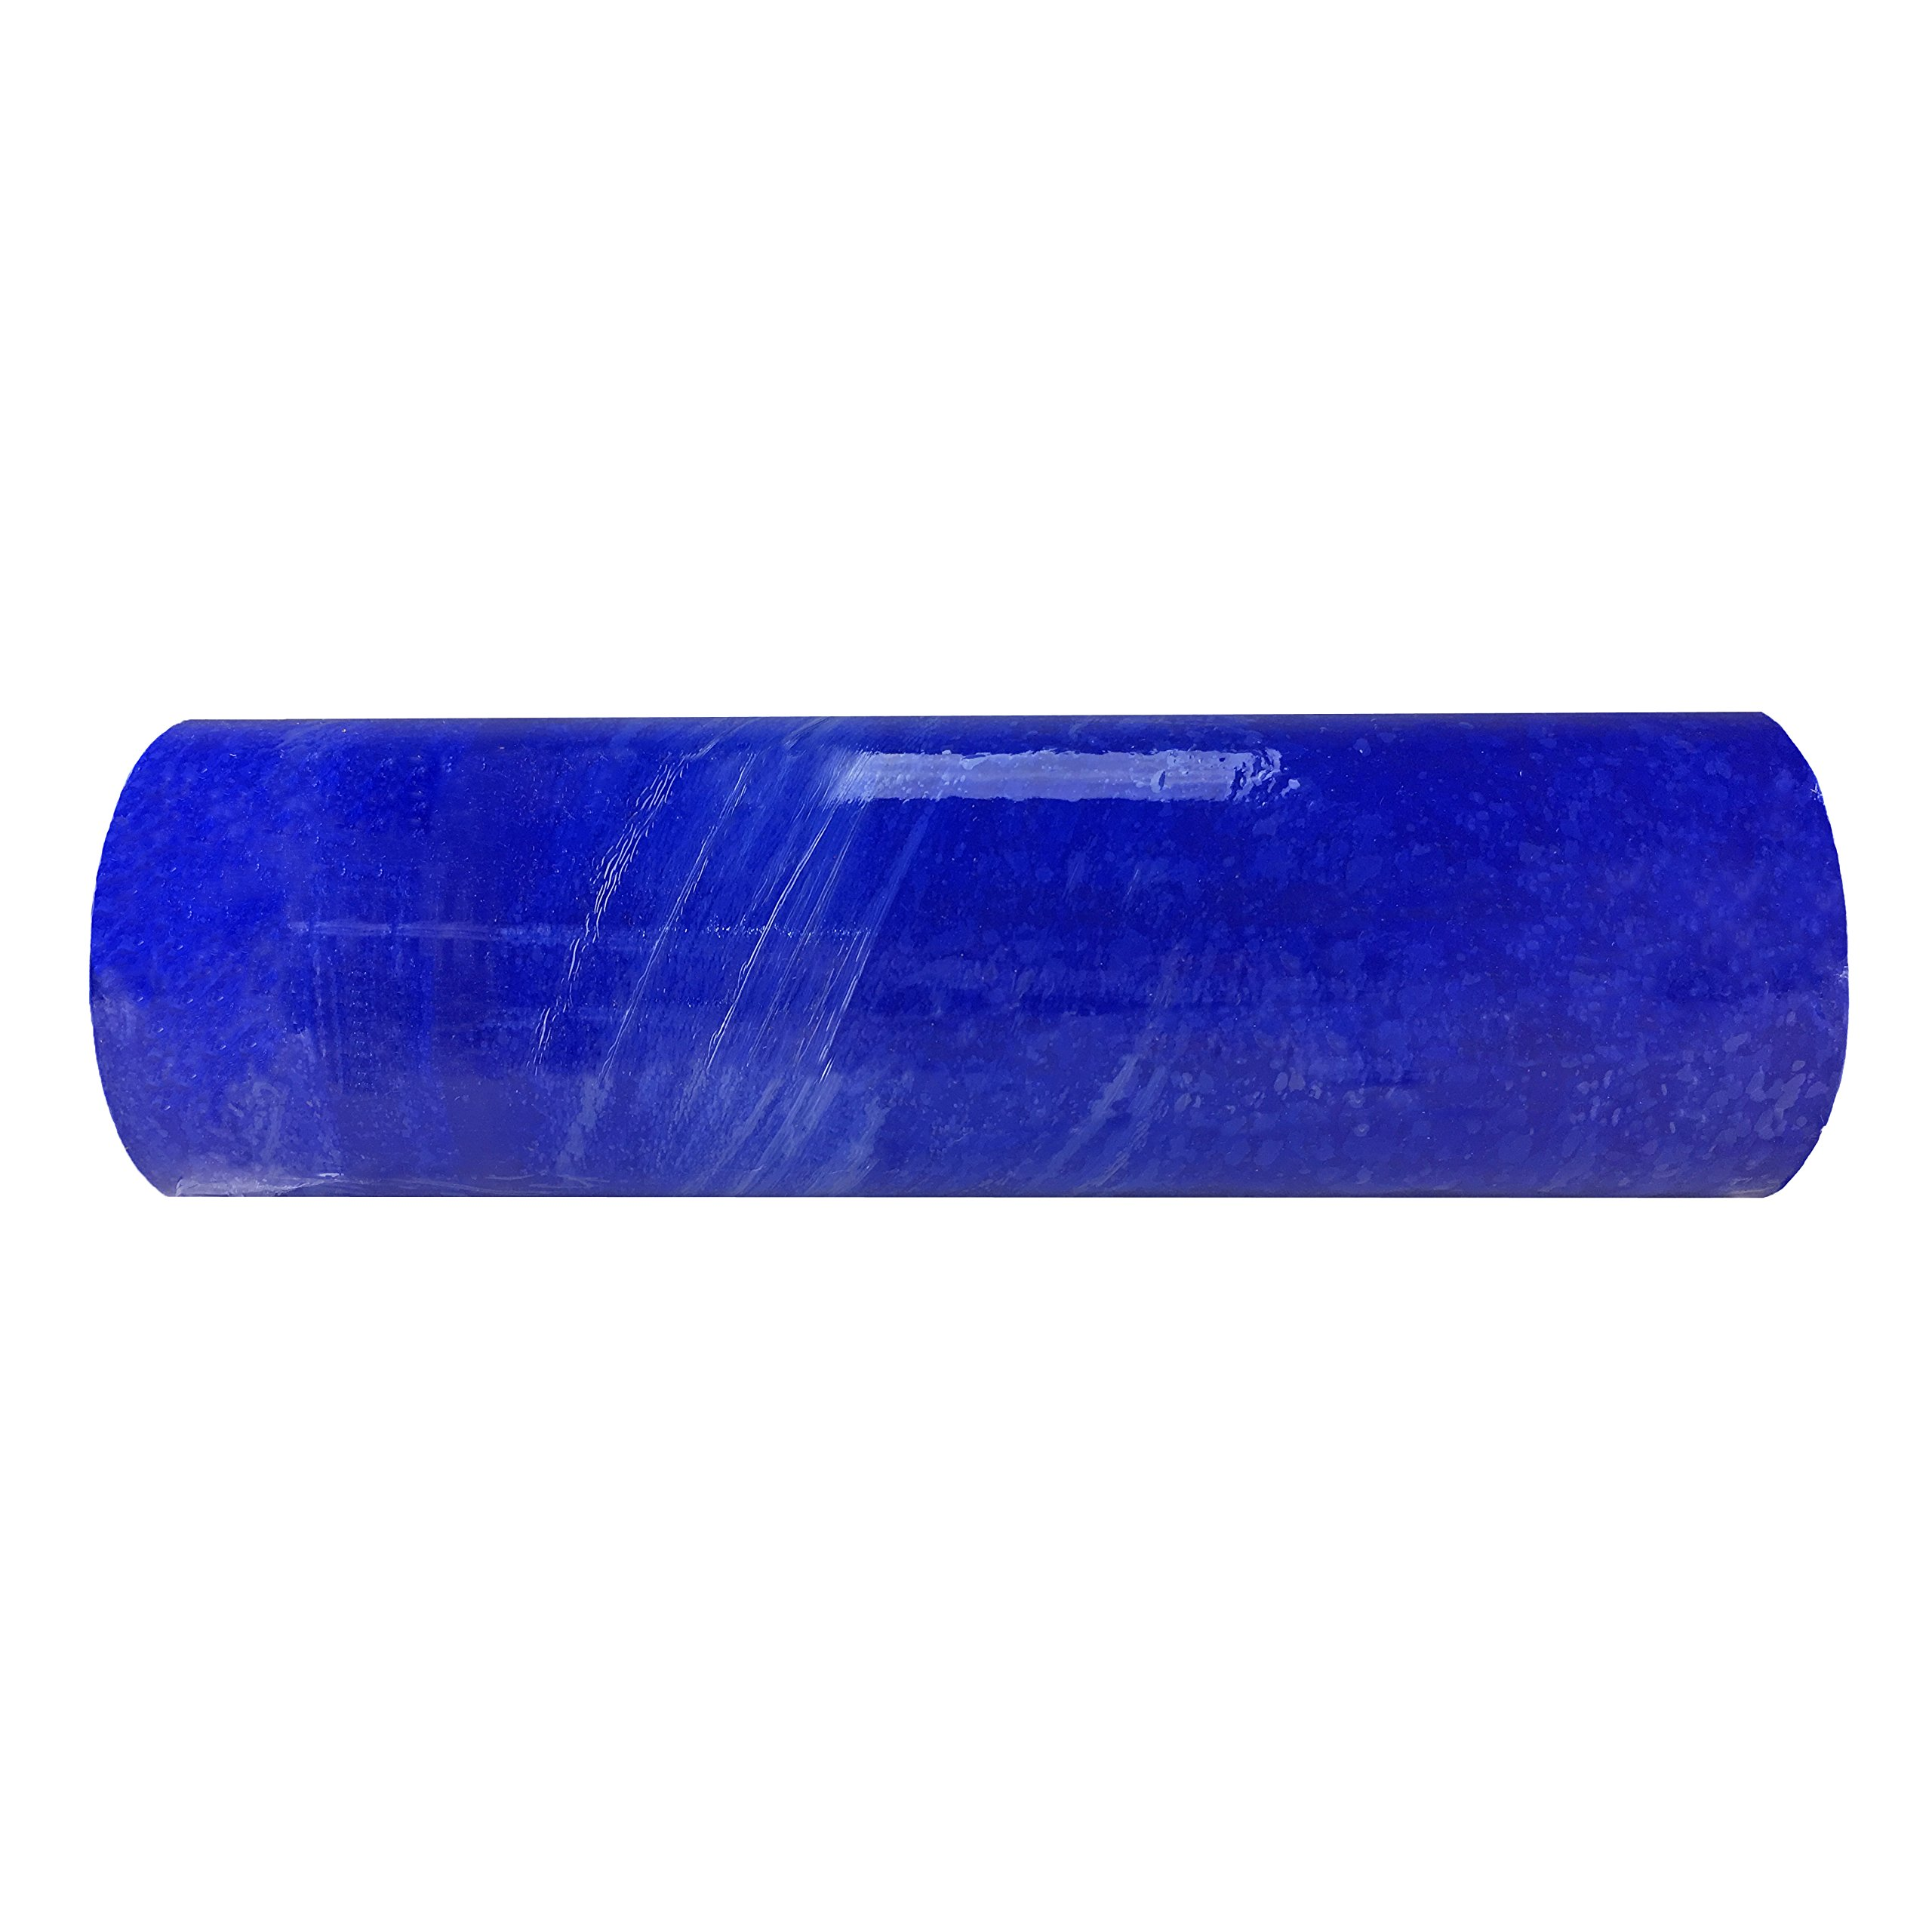 18 x 1500 x 80, 4 RLS/cs Hand Wrap Cast Blue